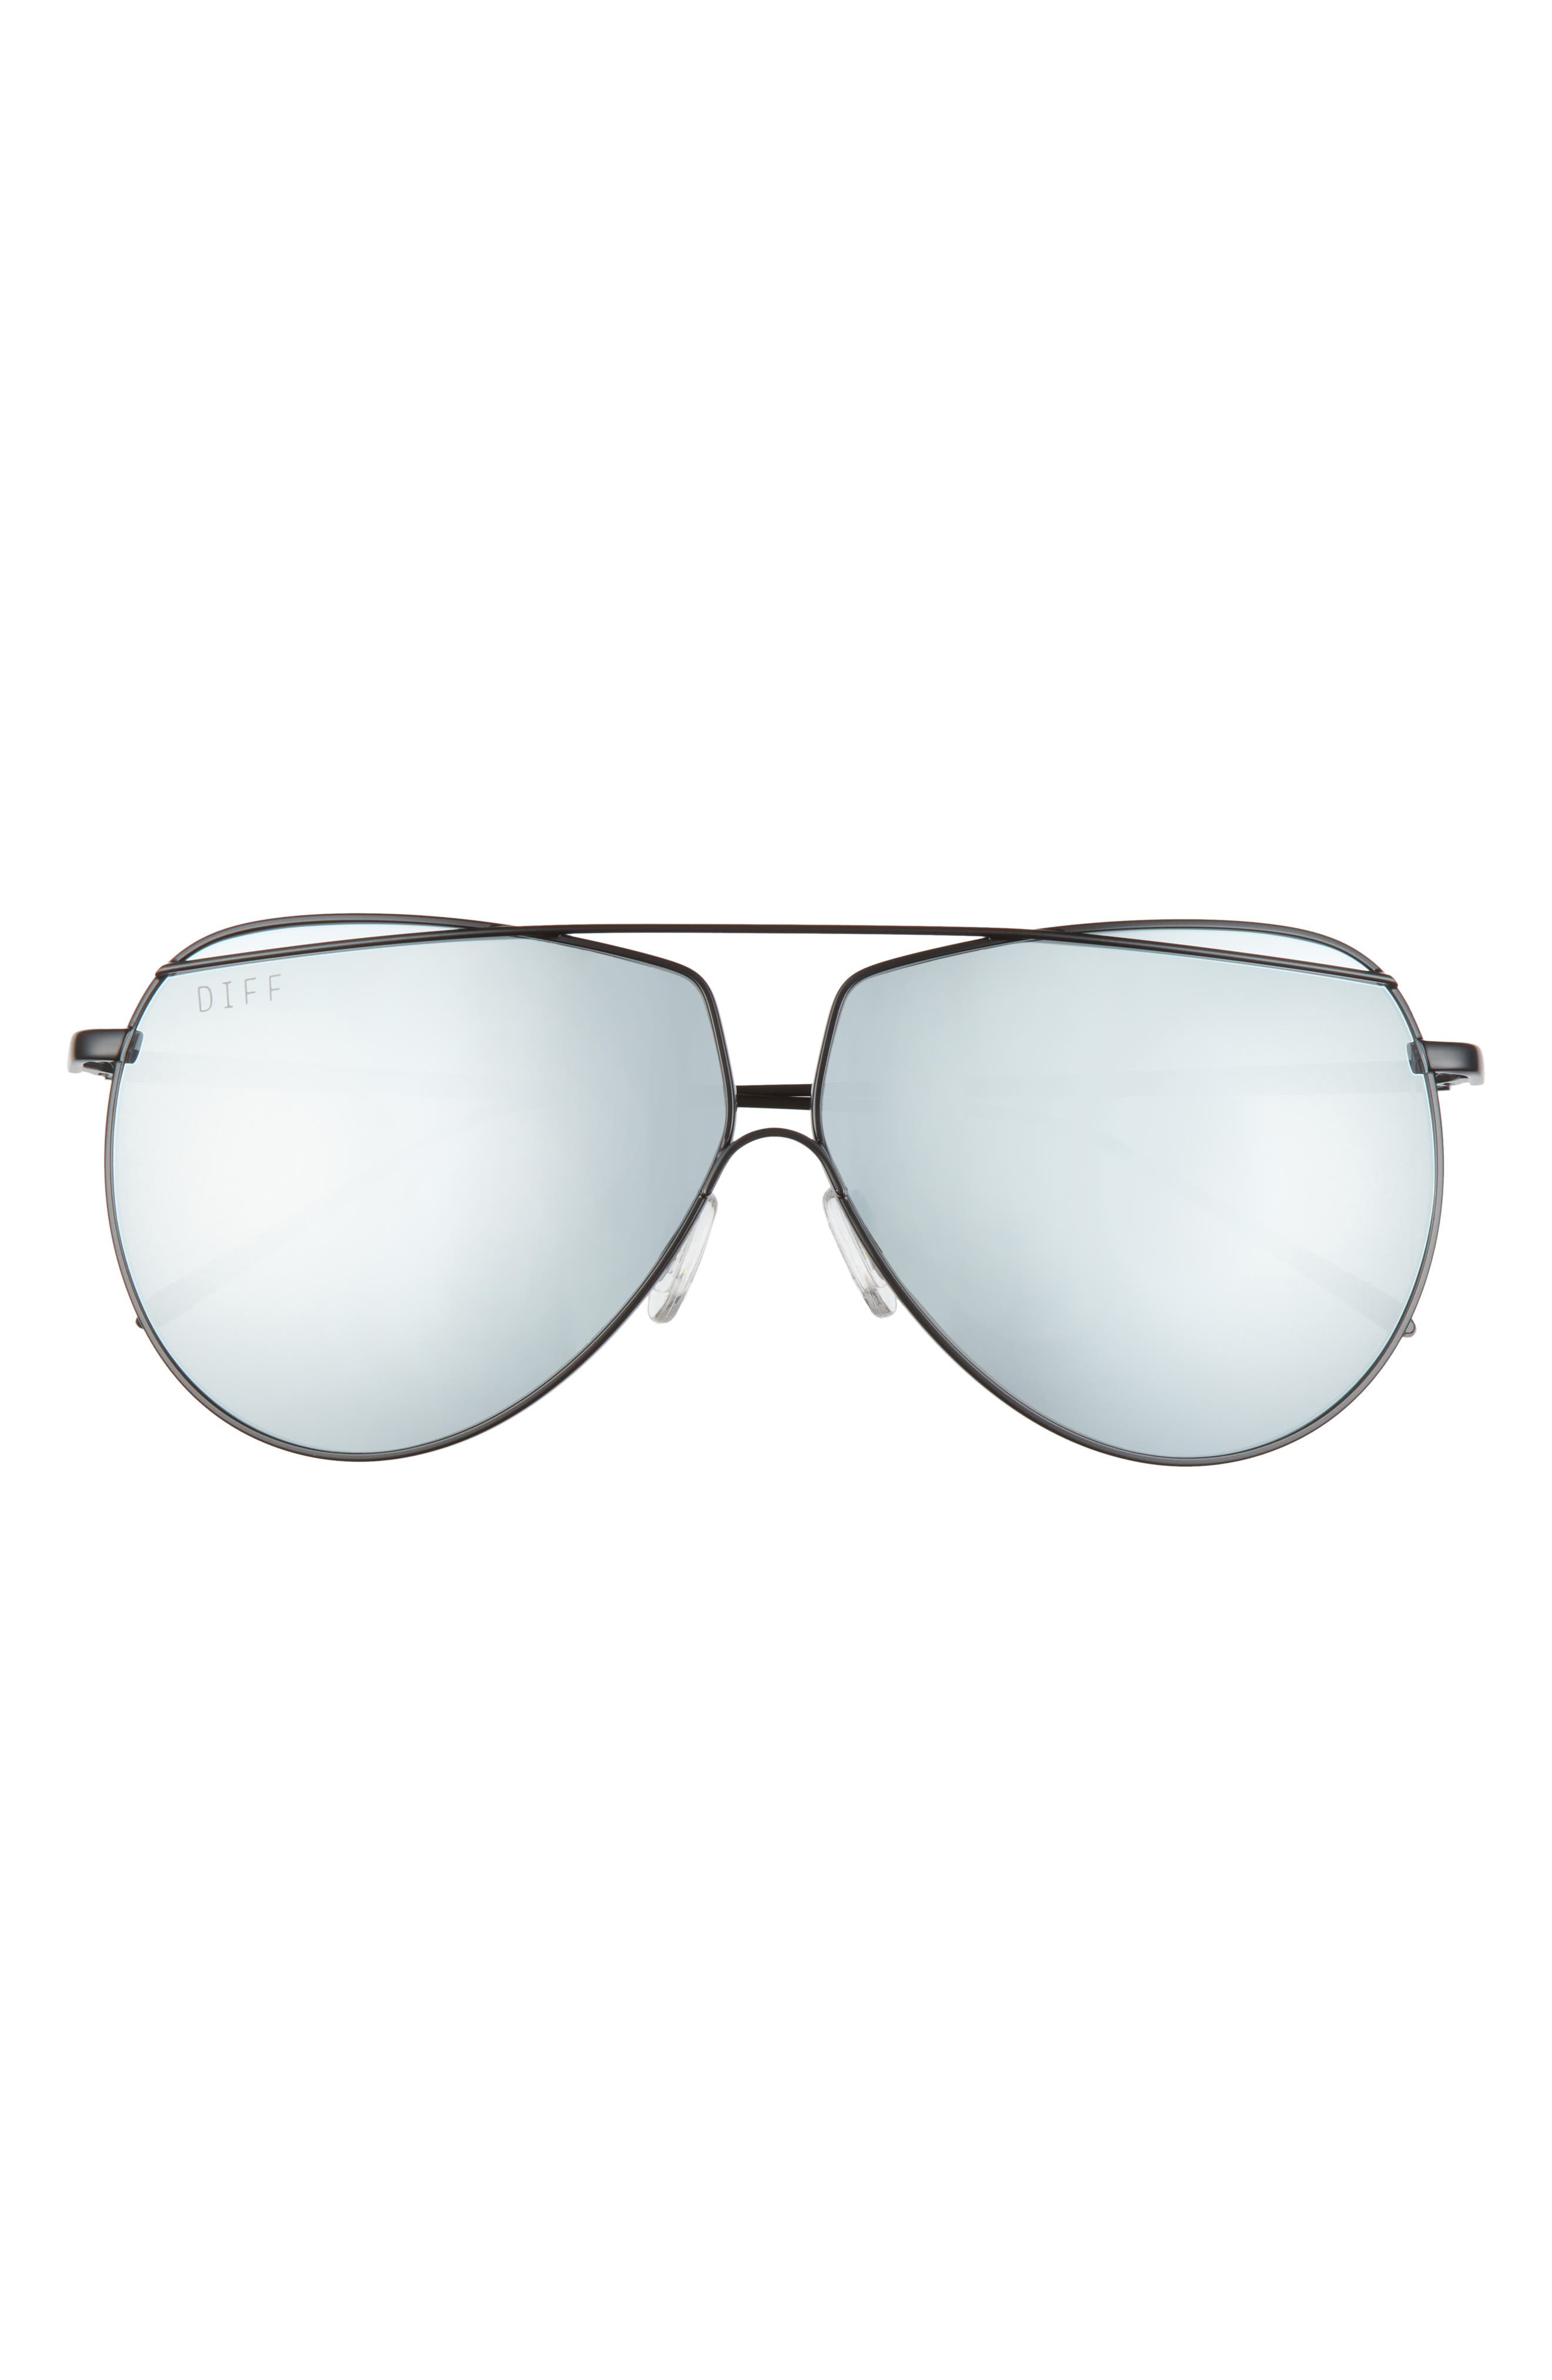 Maeve 65mm Mirrored Polarized Oversize Aviator Sunglasses